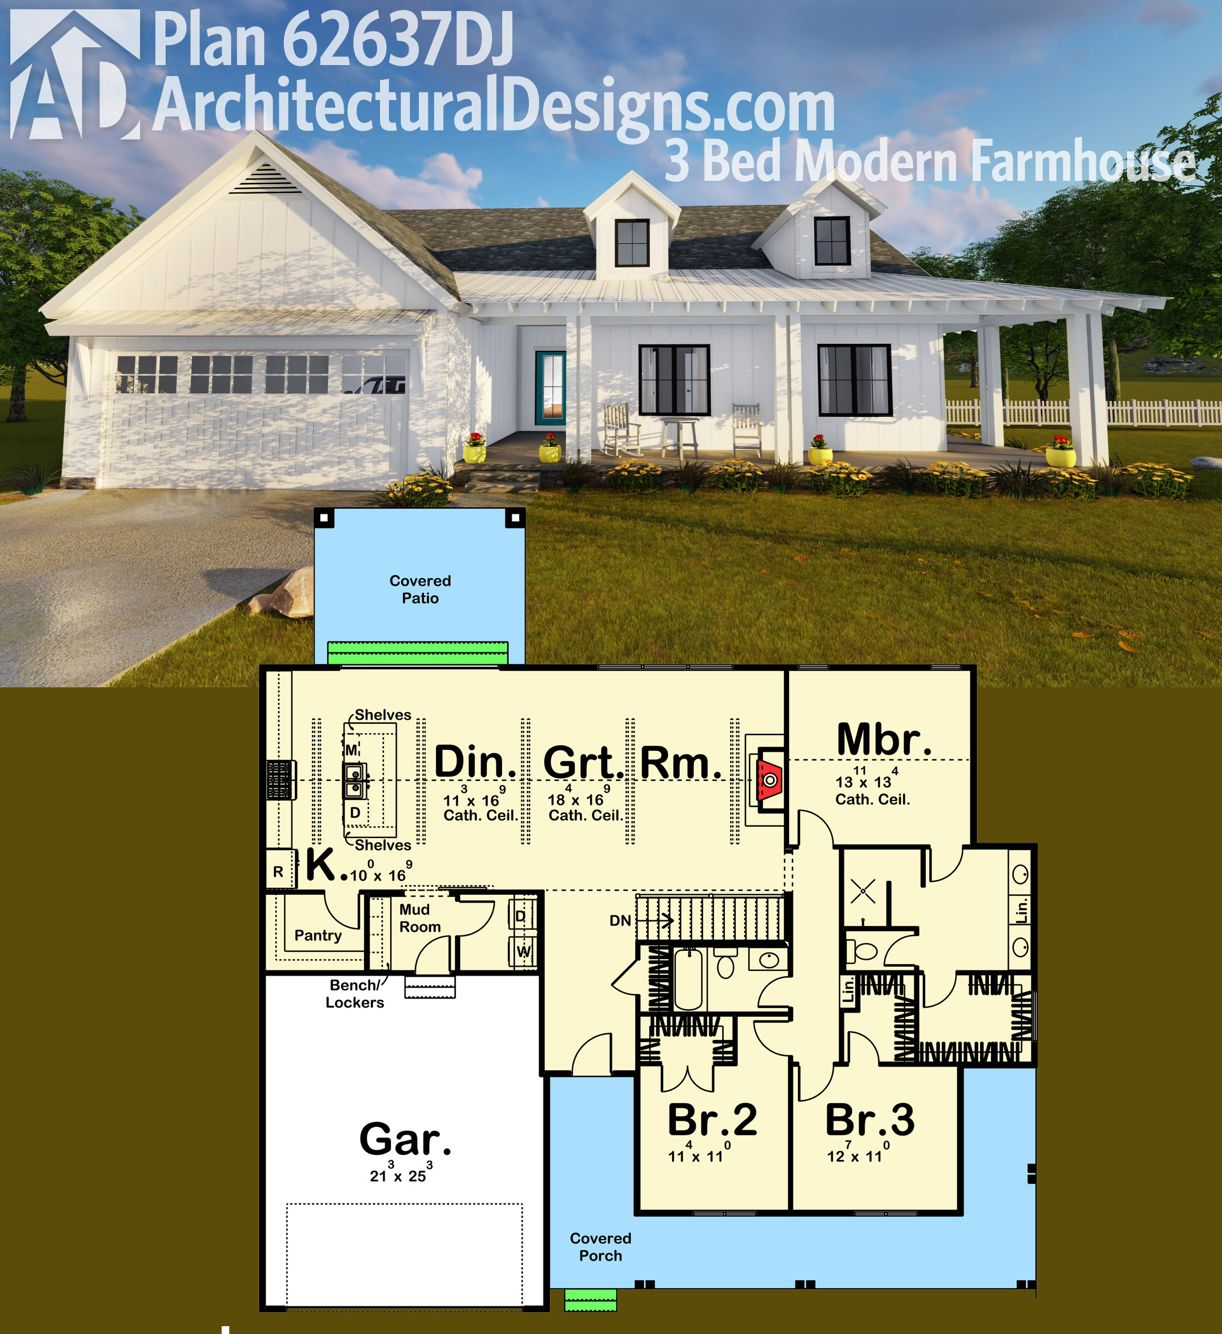 Plan 62637DJ: Modern Farmhouse Plan in 2019 | FLOOR PLAN/HOUSE PLAN on 3 story mediterranean, 3 story floor, 3 story split level plans, 3 story garage plans, 3 story mansion plans, 3 story townhouse plans,